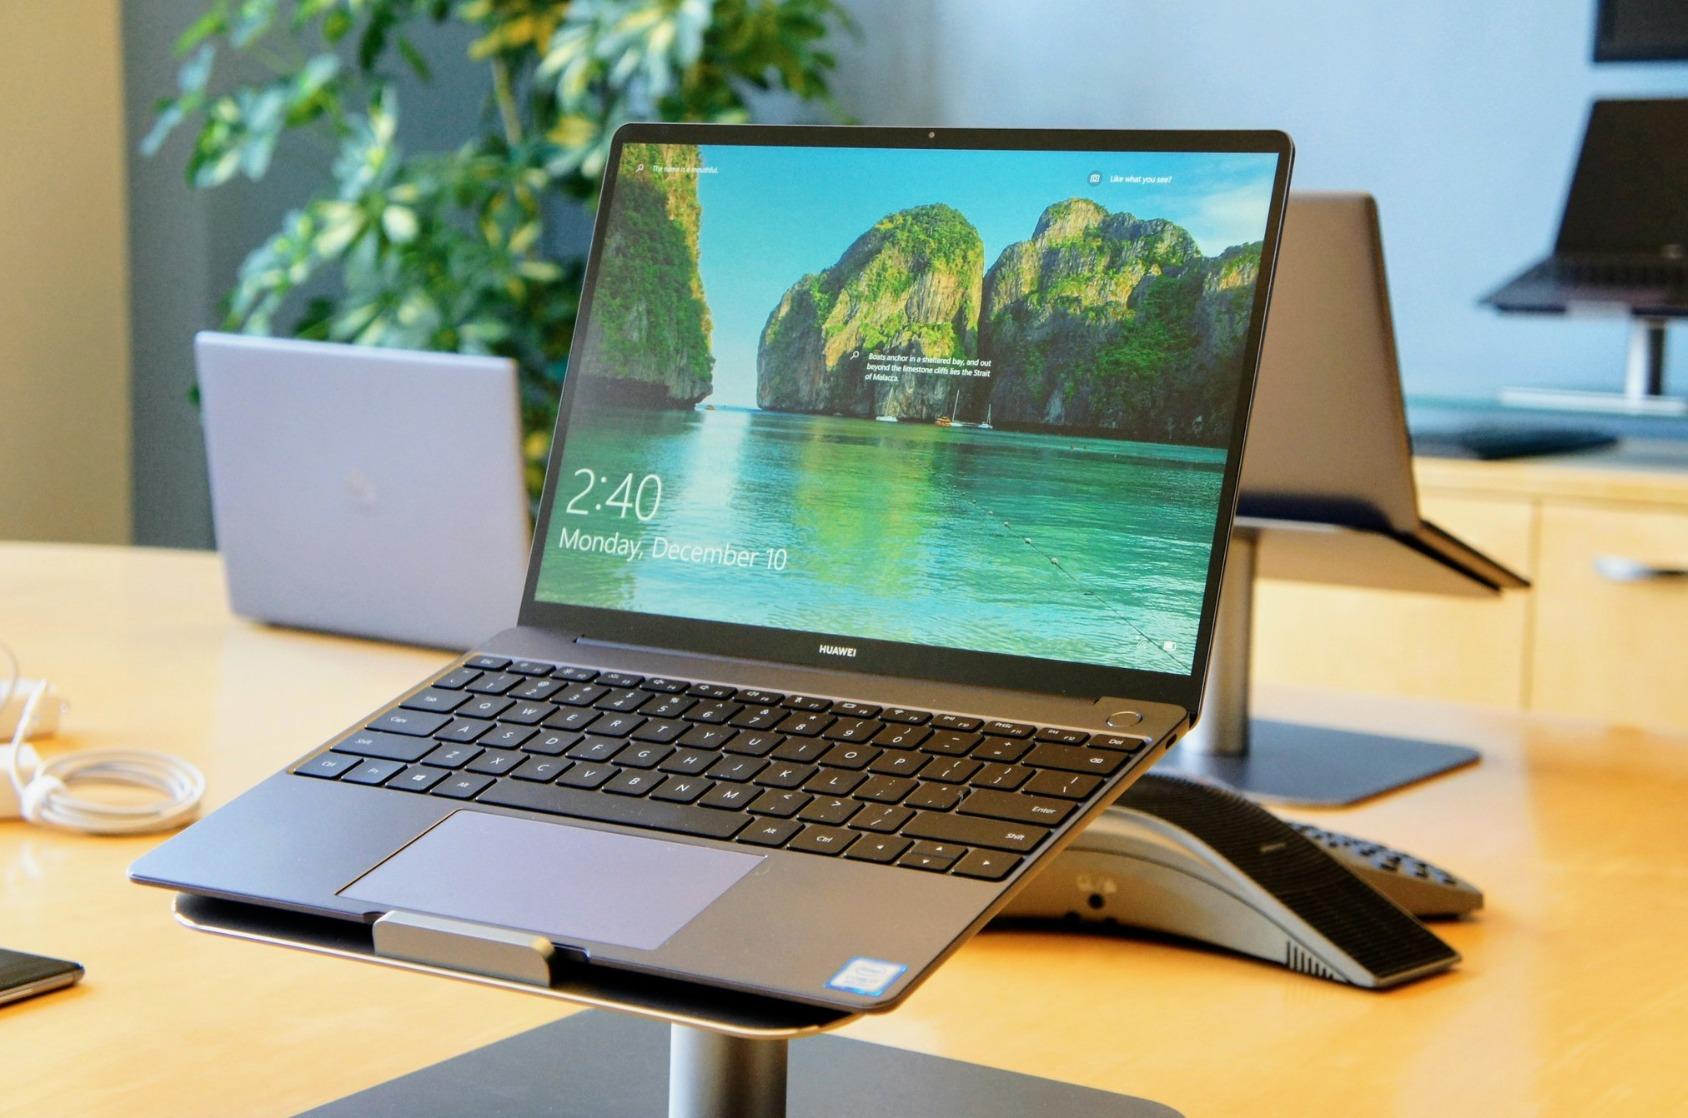 Apple MacBook Air vs Huawei MateBook 13: Which Is The Best Laptop?